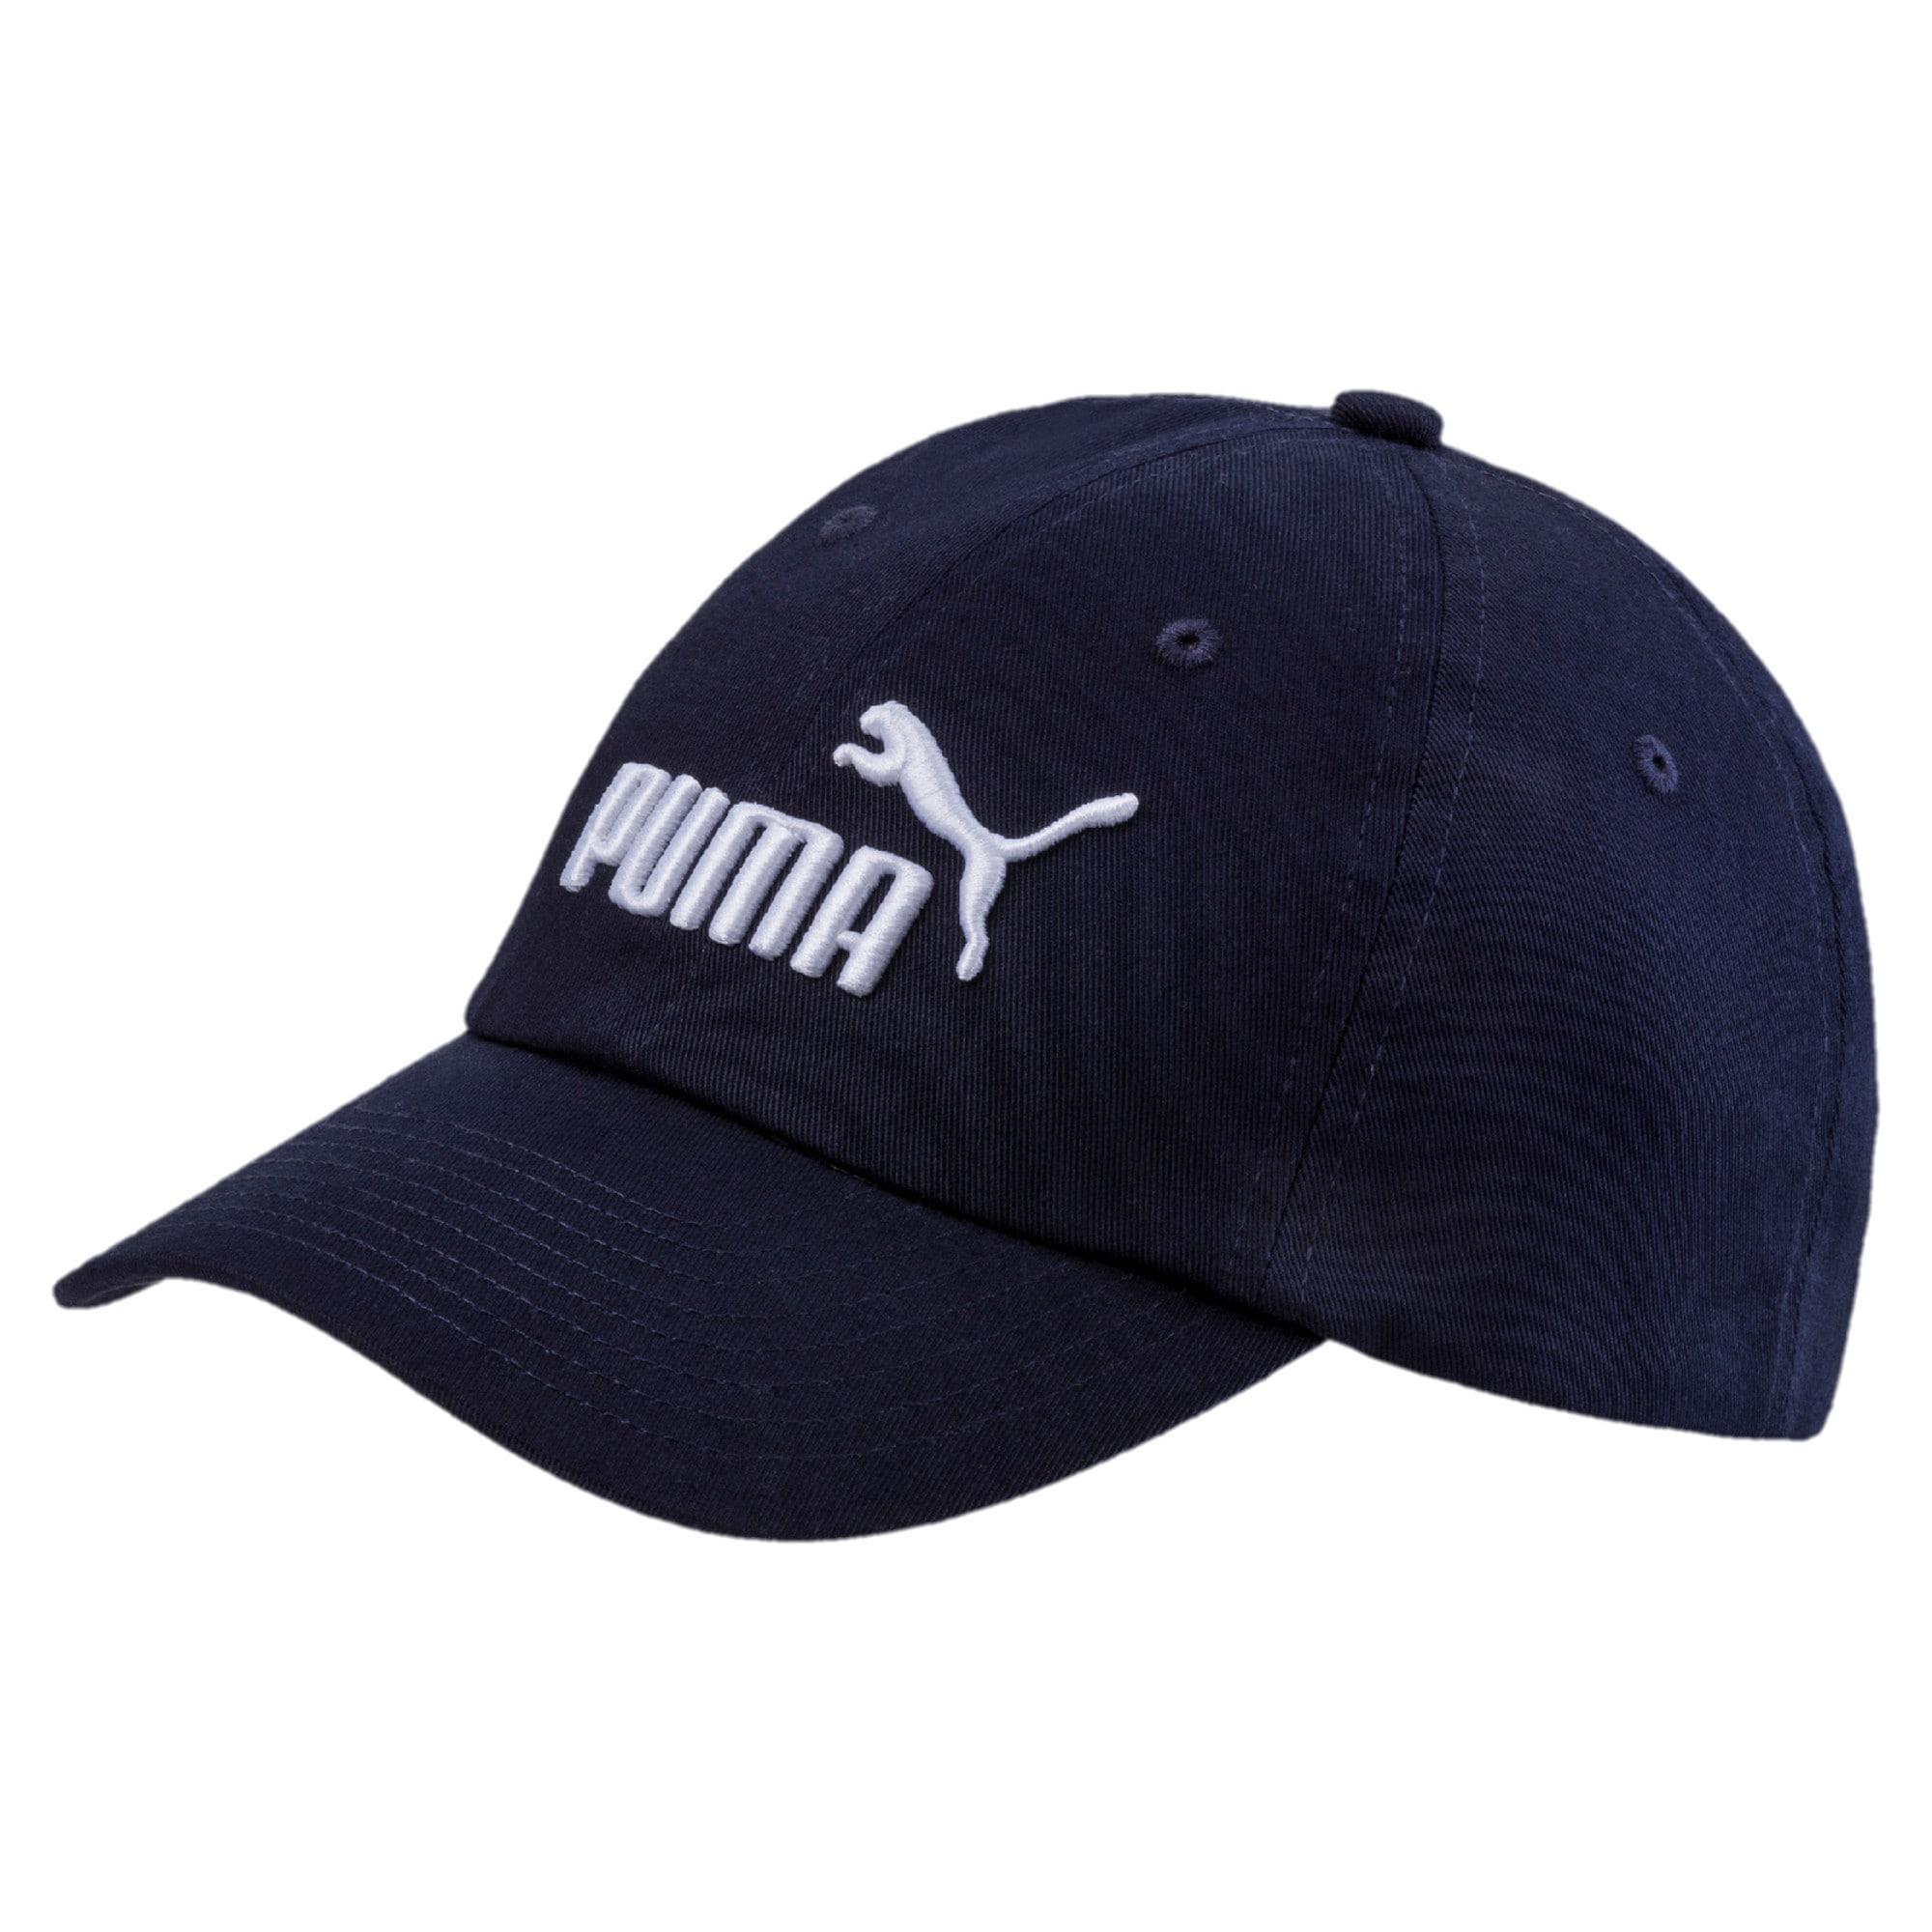 PUMA Sportinė kepurė 'Essentials' nakties mėlyna